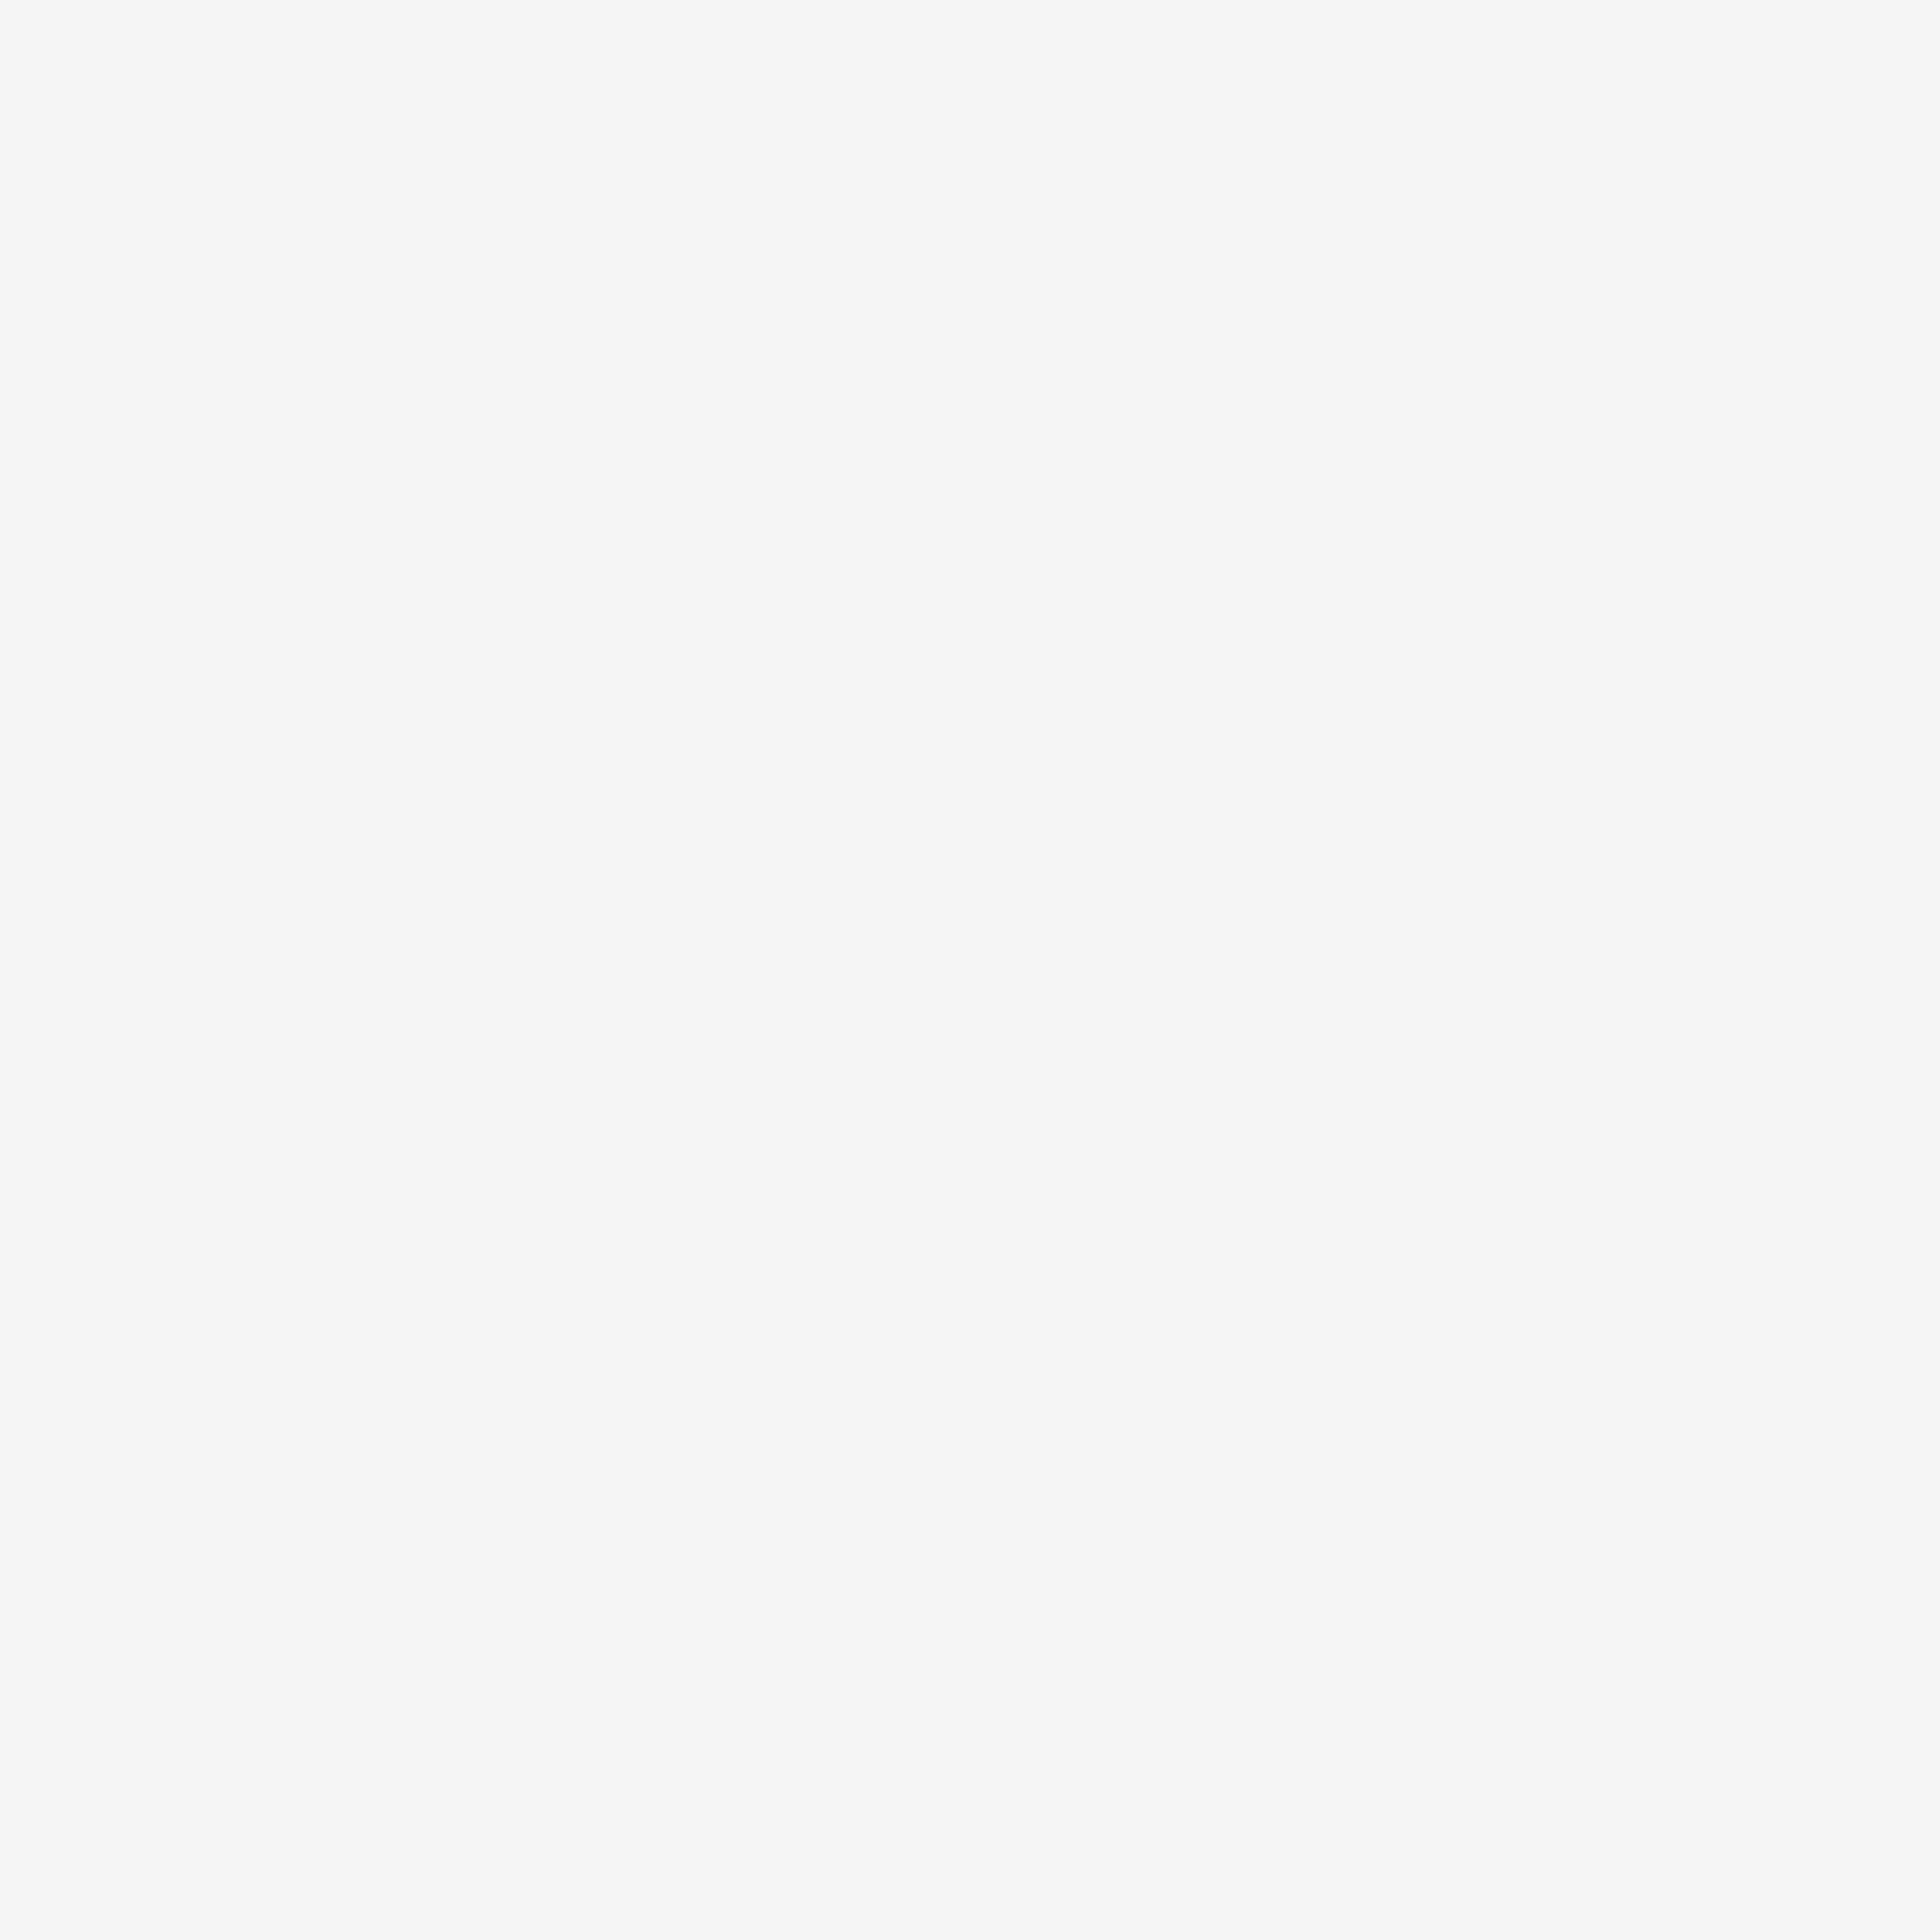 Puma Borussia Dortmund Trainingspak 20192020